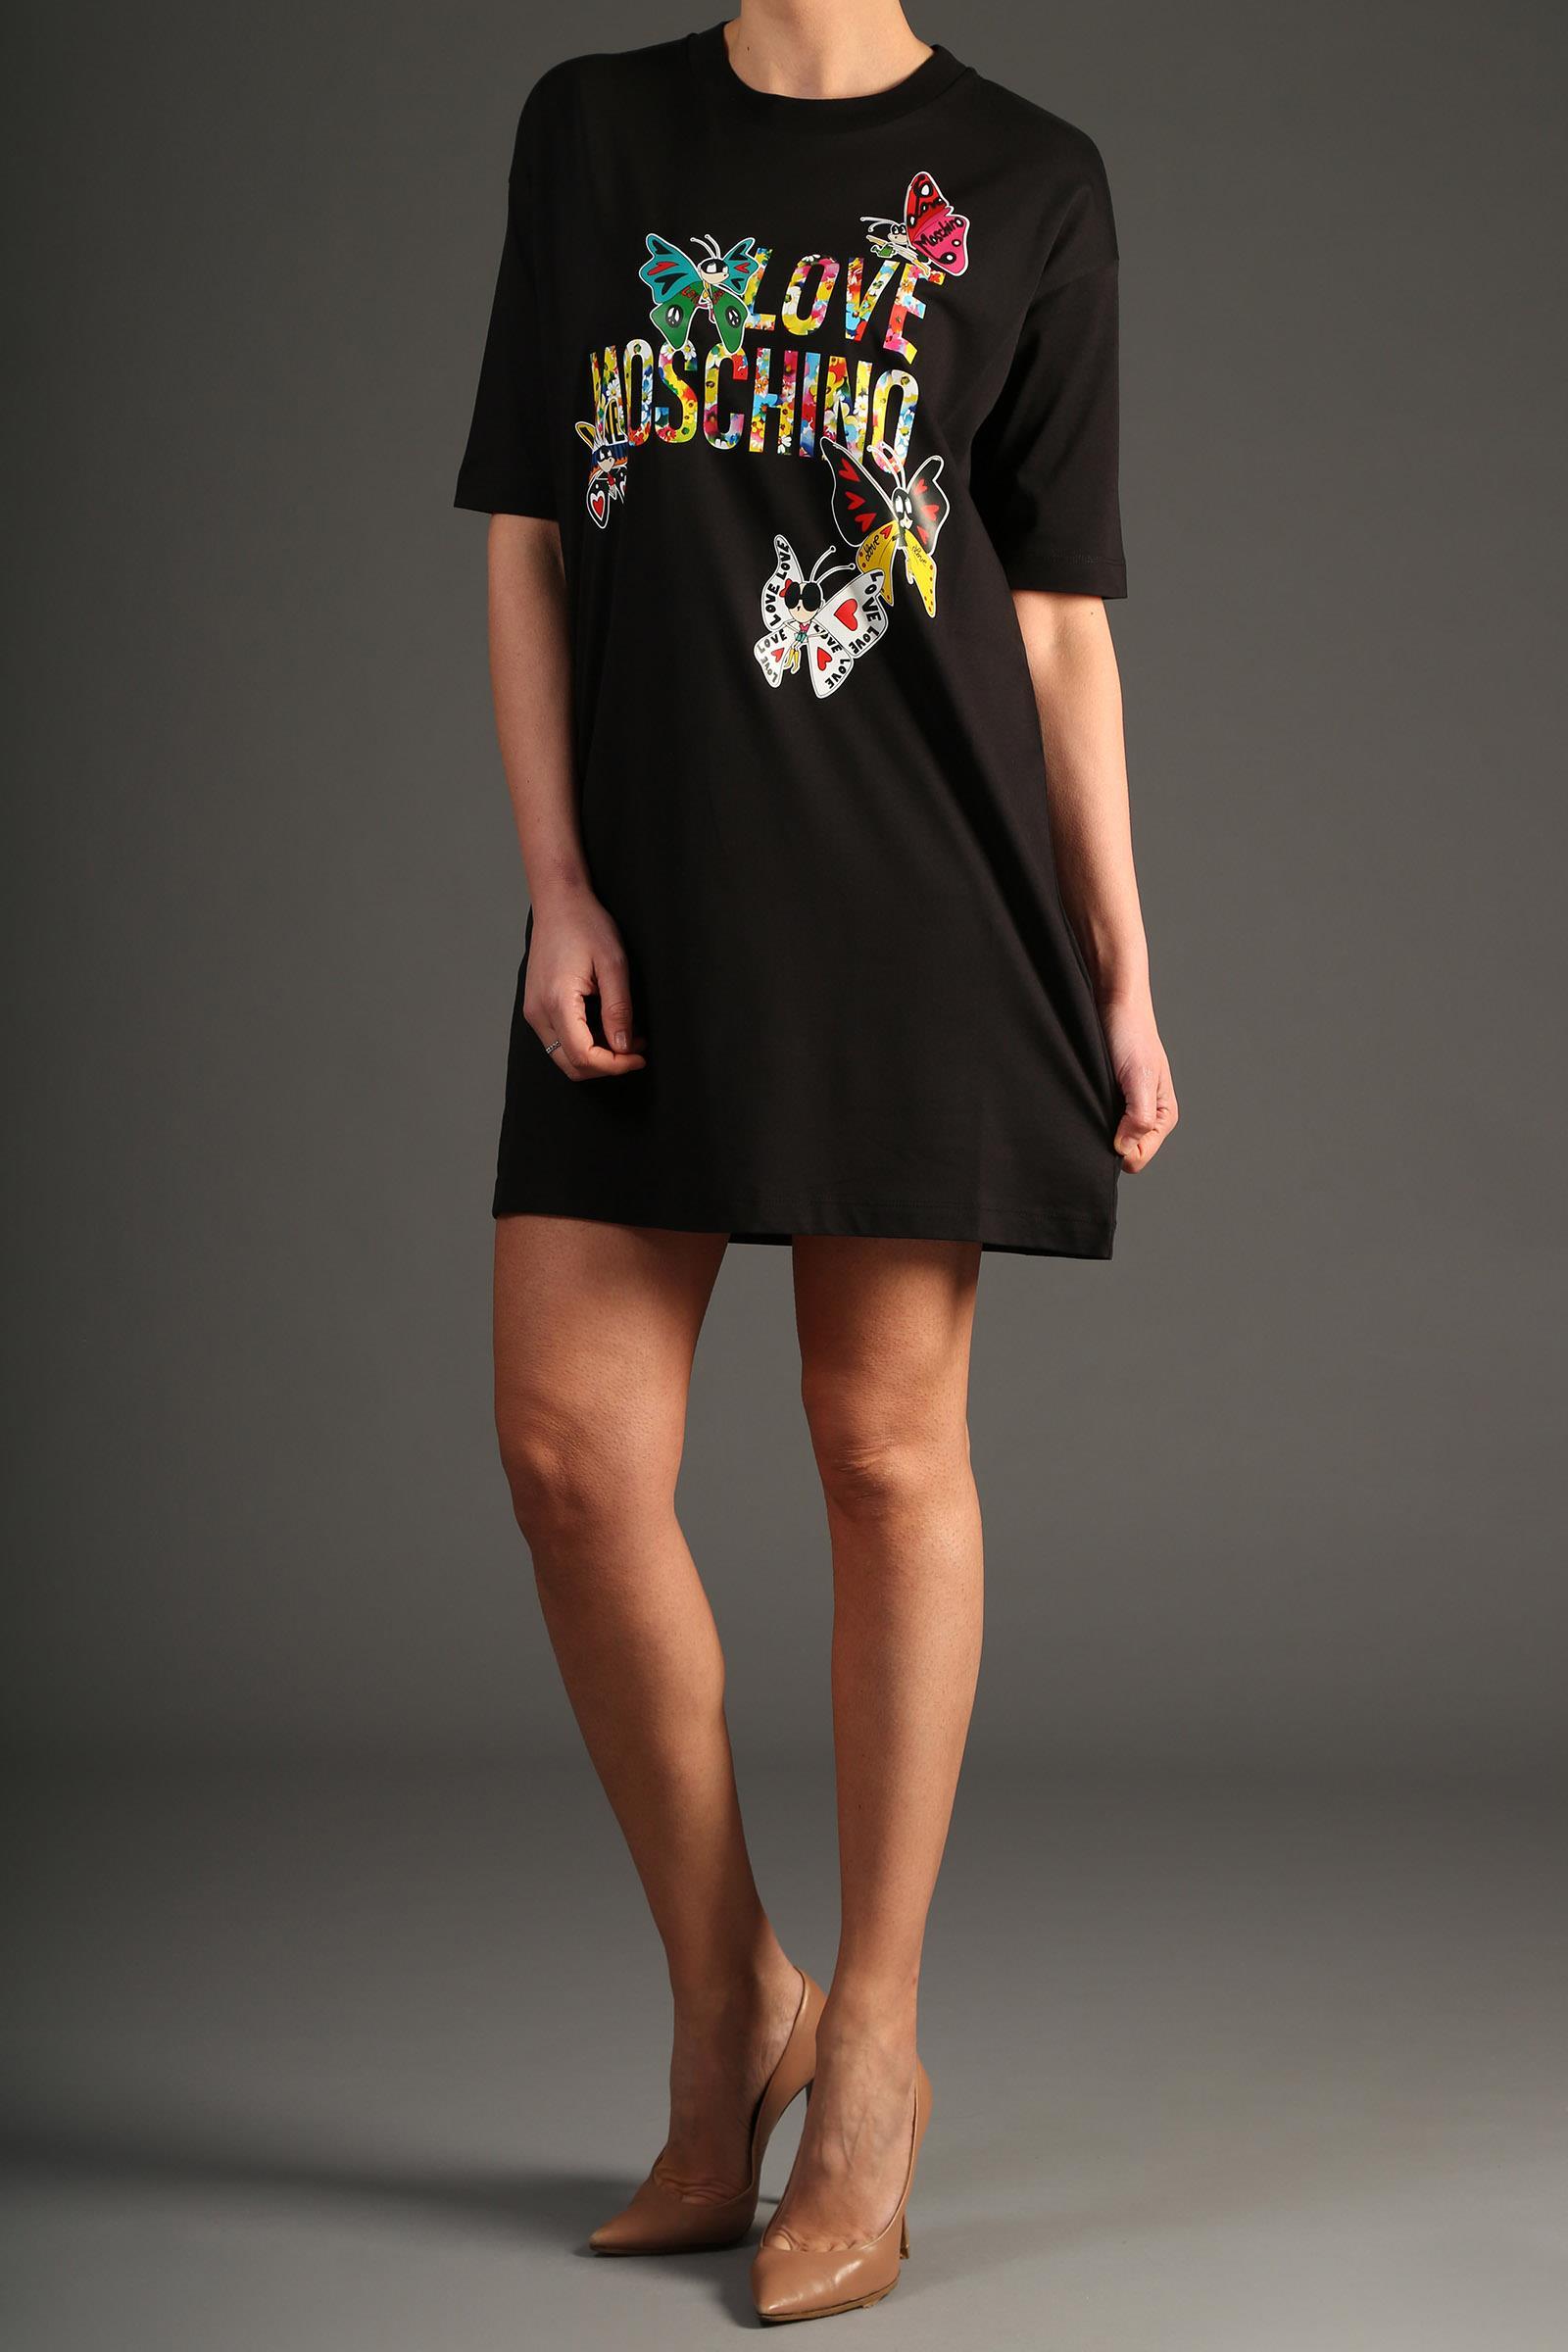 online retailer 91279 4a106 Abito Love Moschino